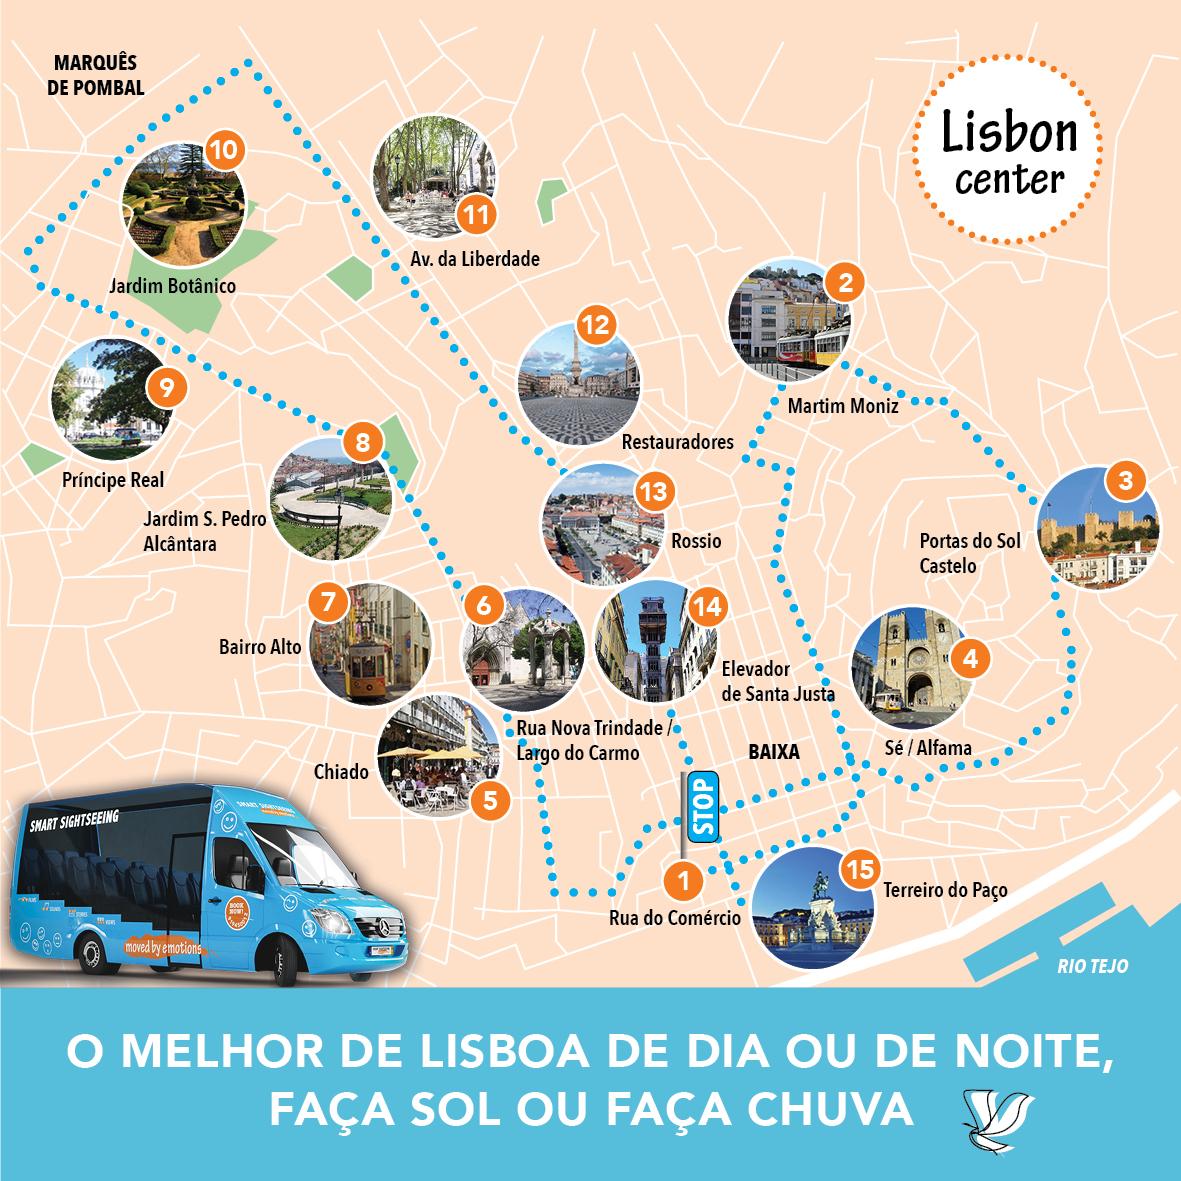 Tour Smart Sightseeing